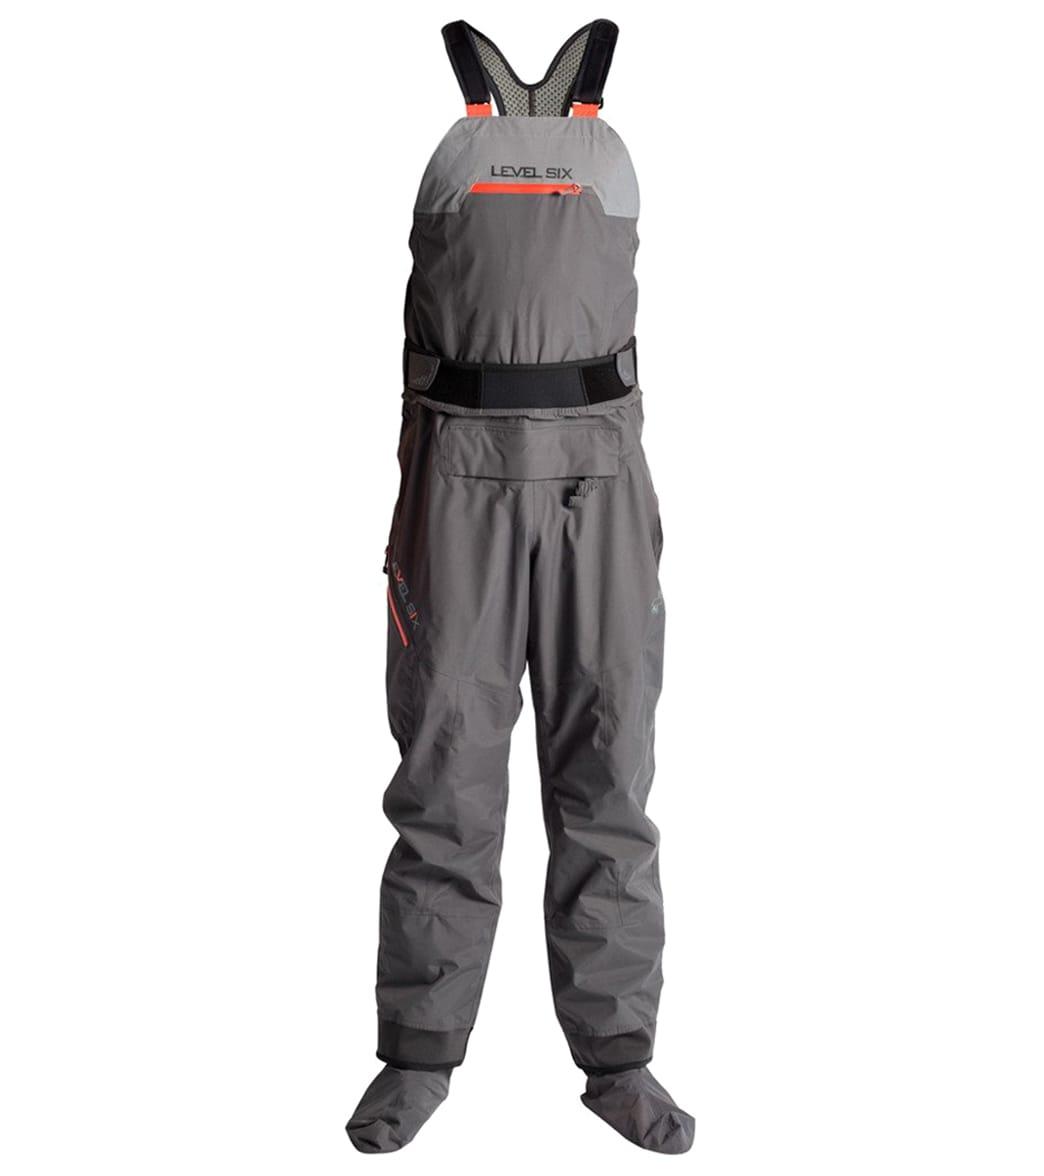 b69b462017 Level Six Men's Breakwater Bib 2.5 Ply Semi-Dry Pant with Sock at  SwimOutlet.com - Free Shipping